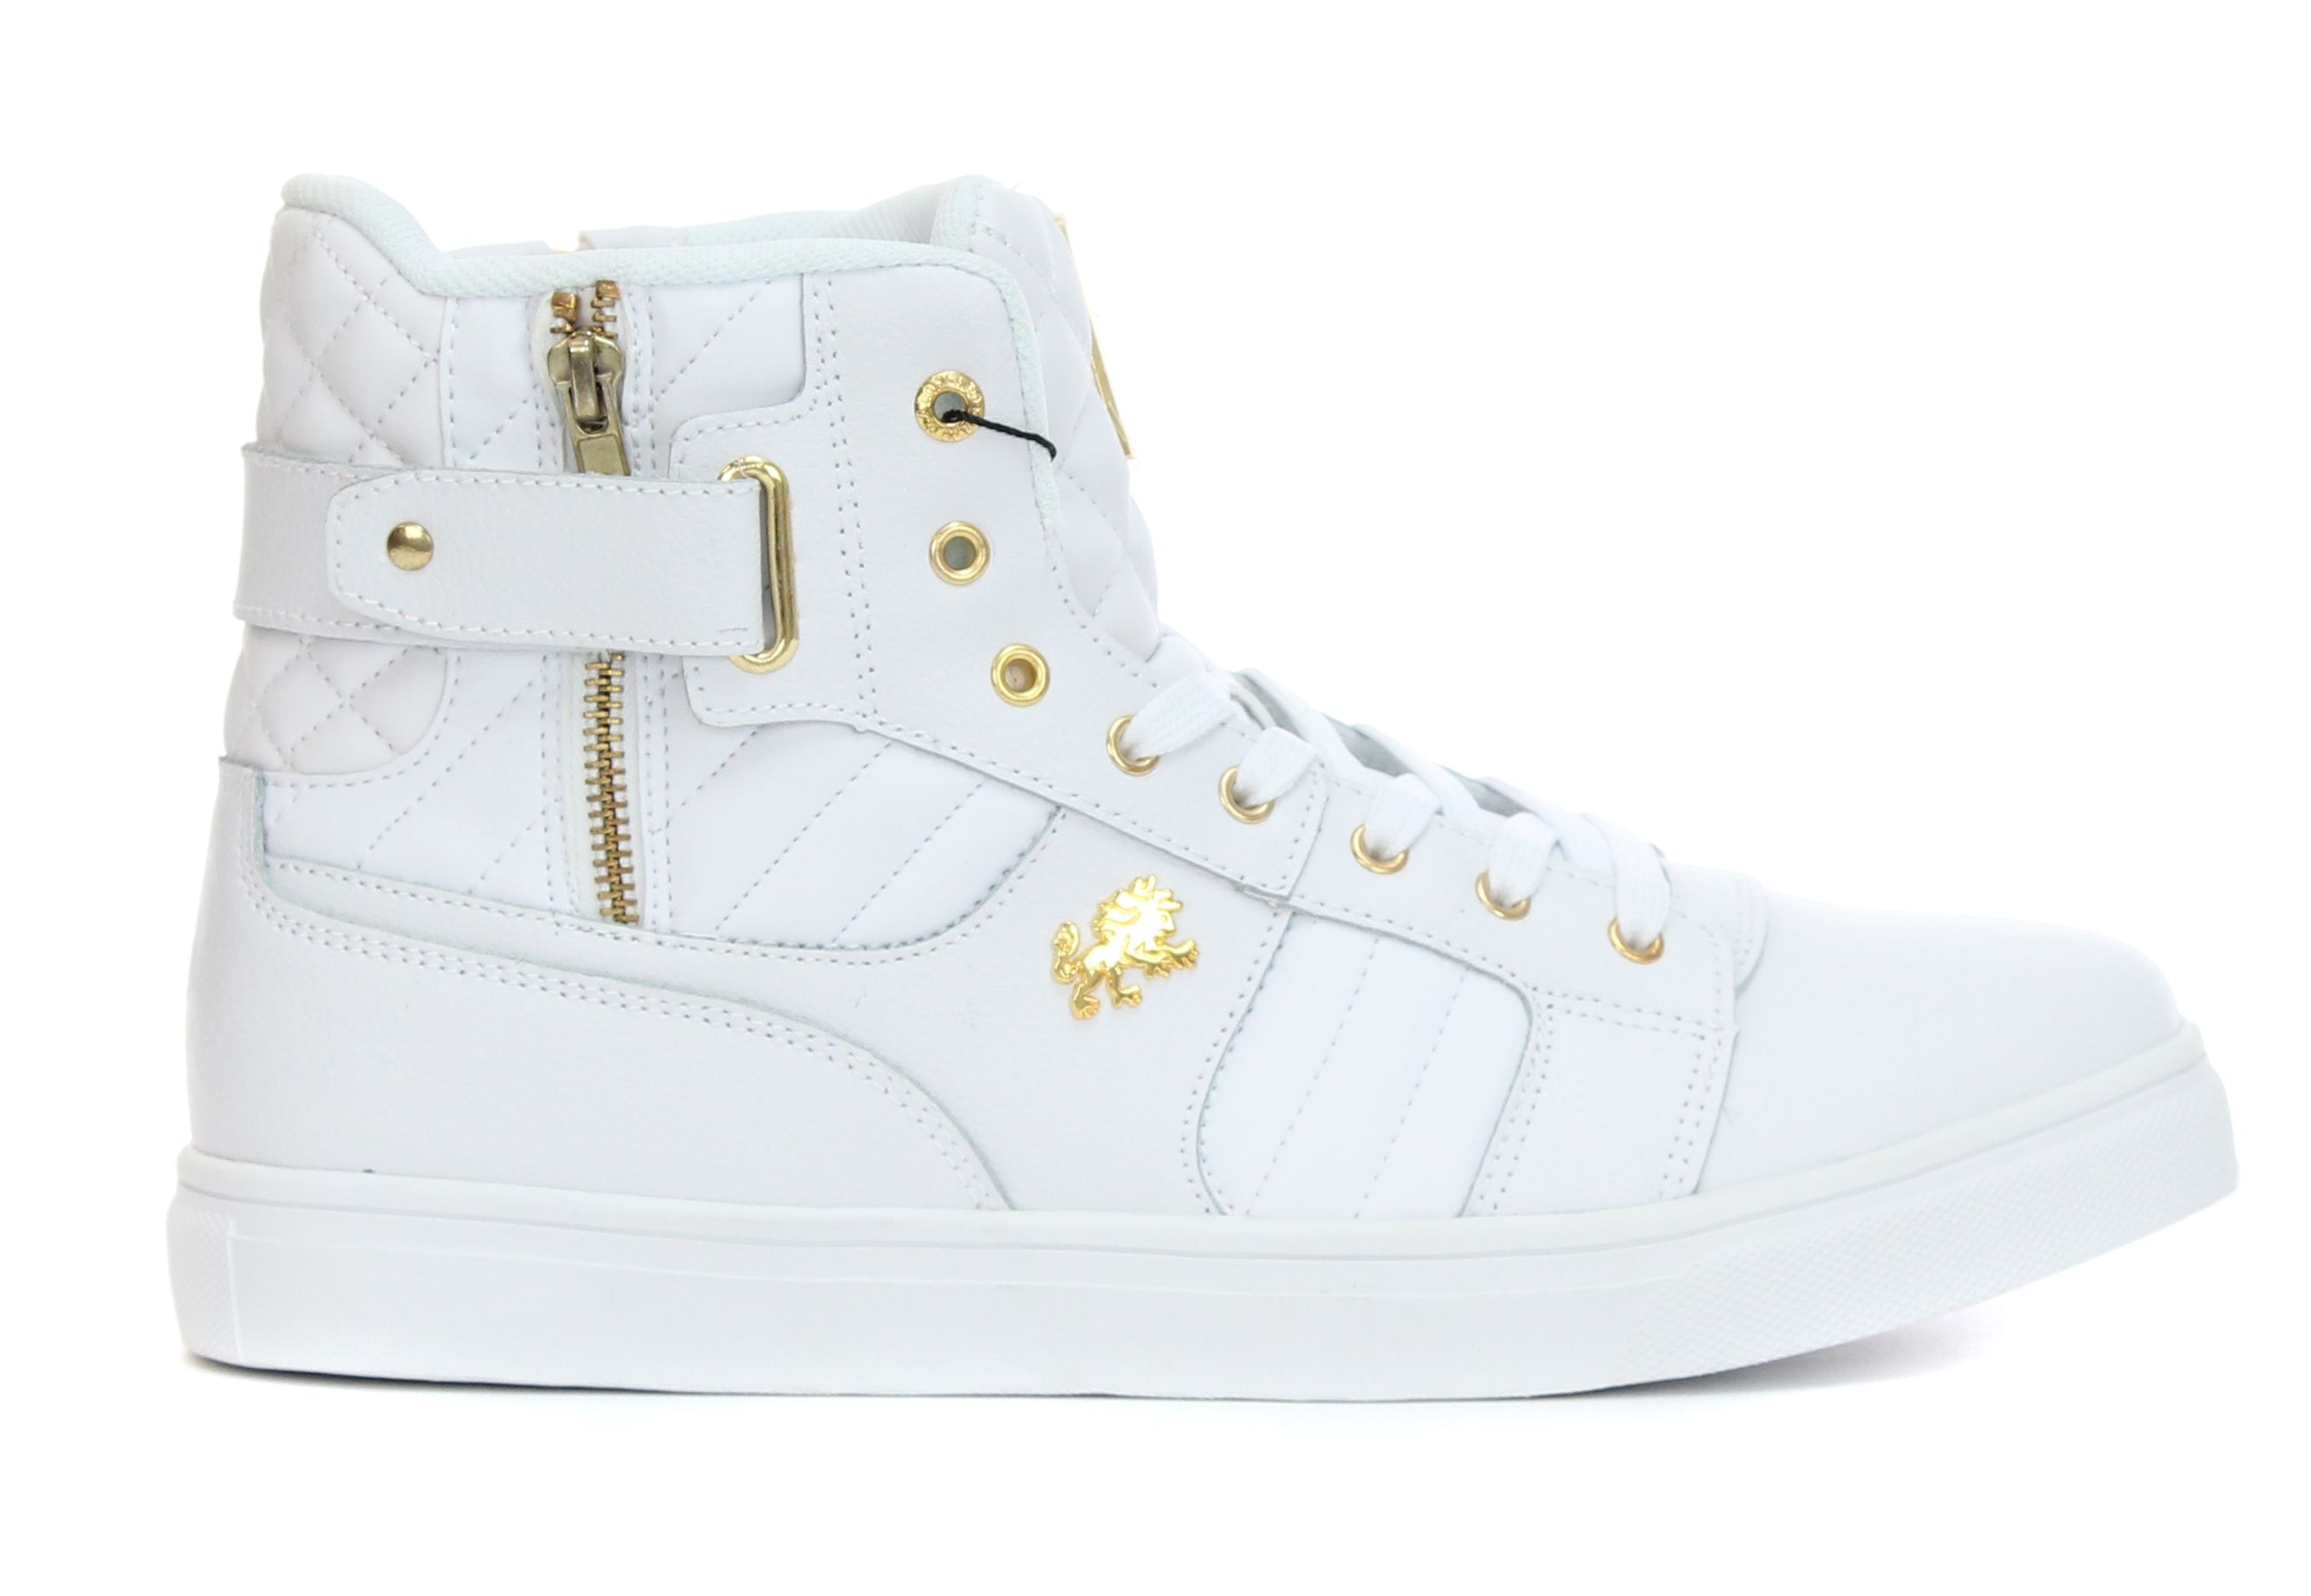 Vlado Footwear Midas  Hi Top Sneakers   Midas   be00dc